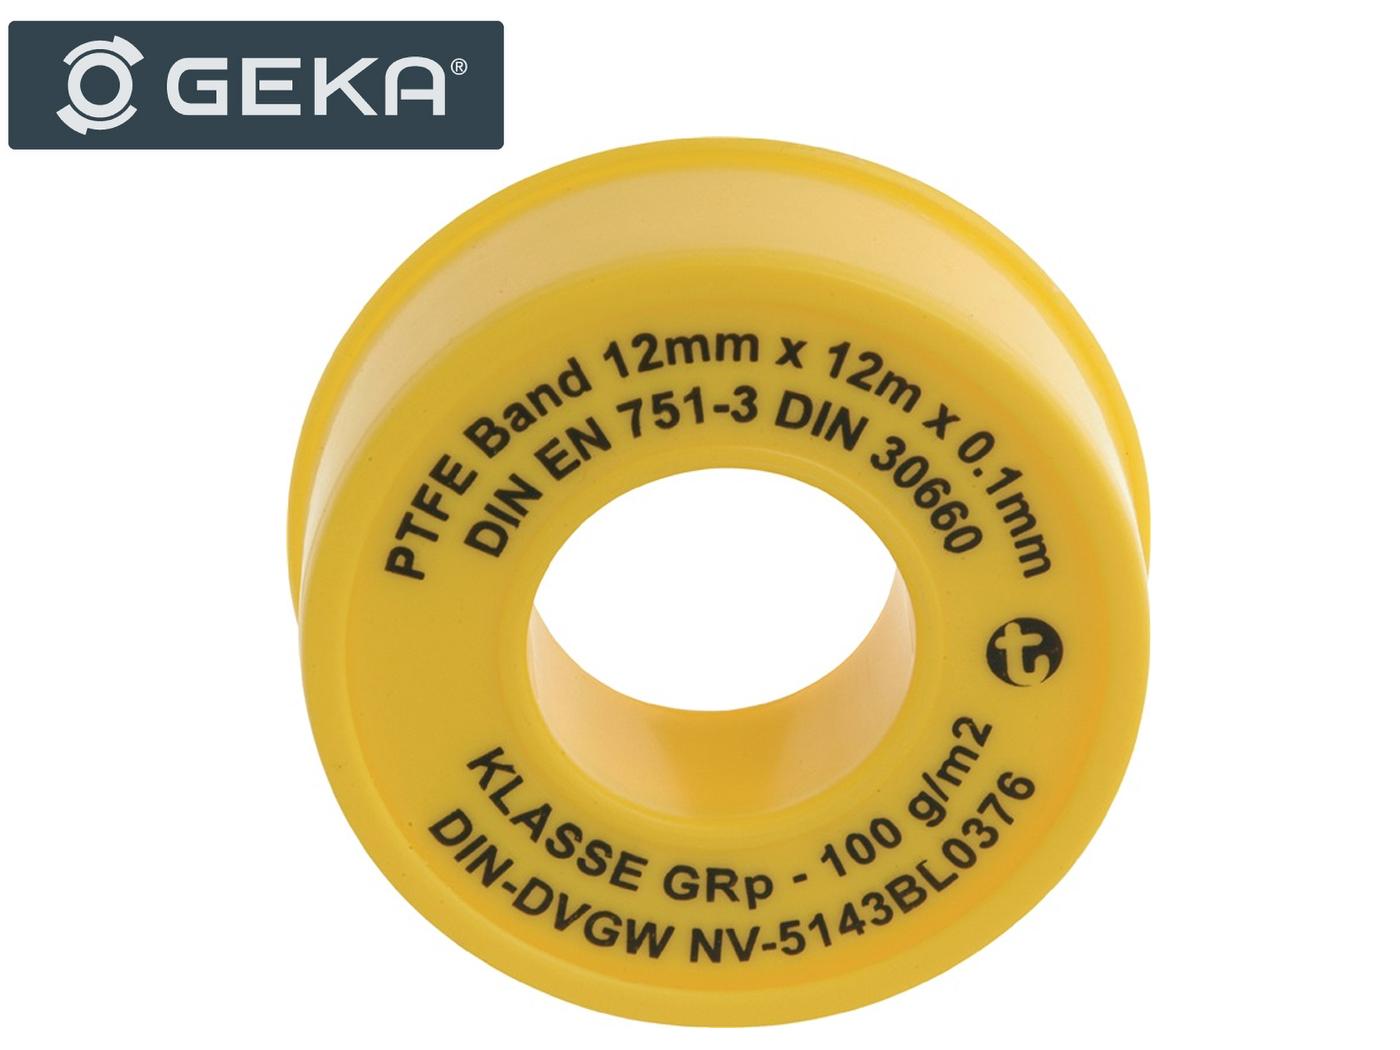 PTFE-afdichtingsband GRP L12m B12mm D0,1mm 100g / m² Rl.GEKA